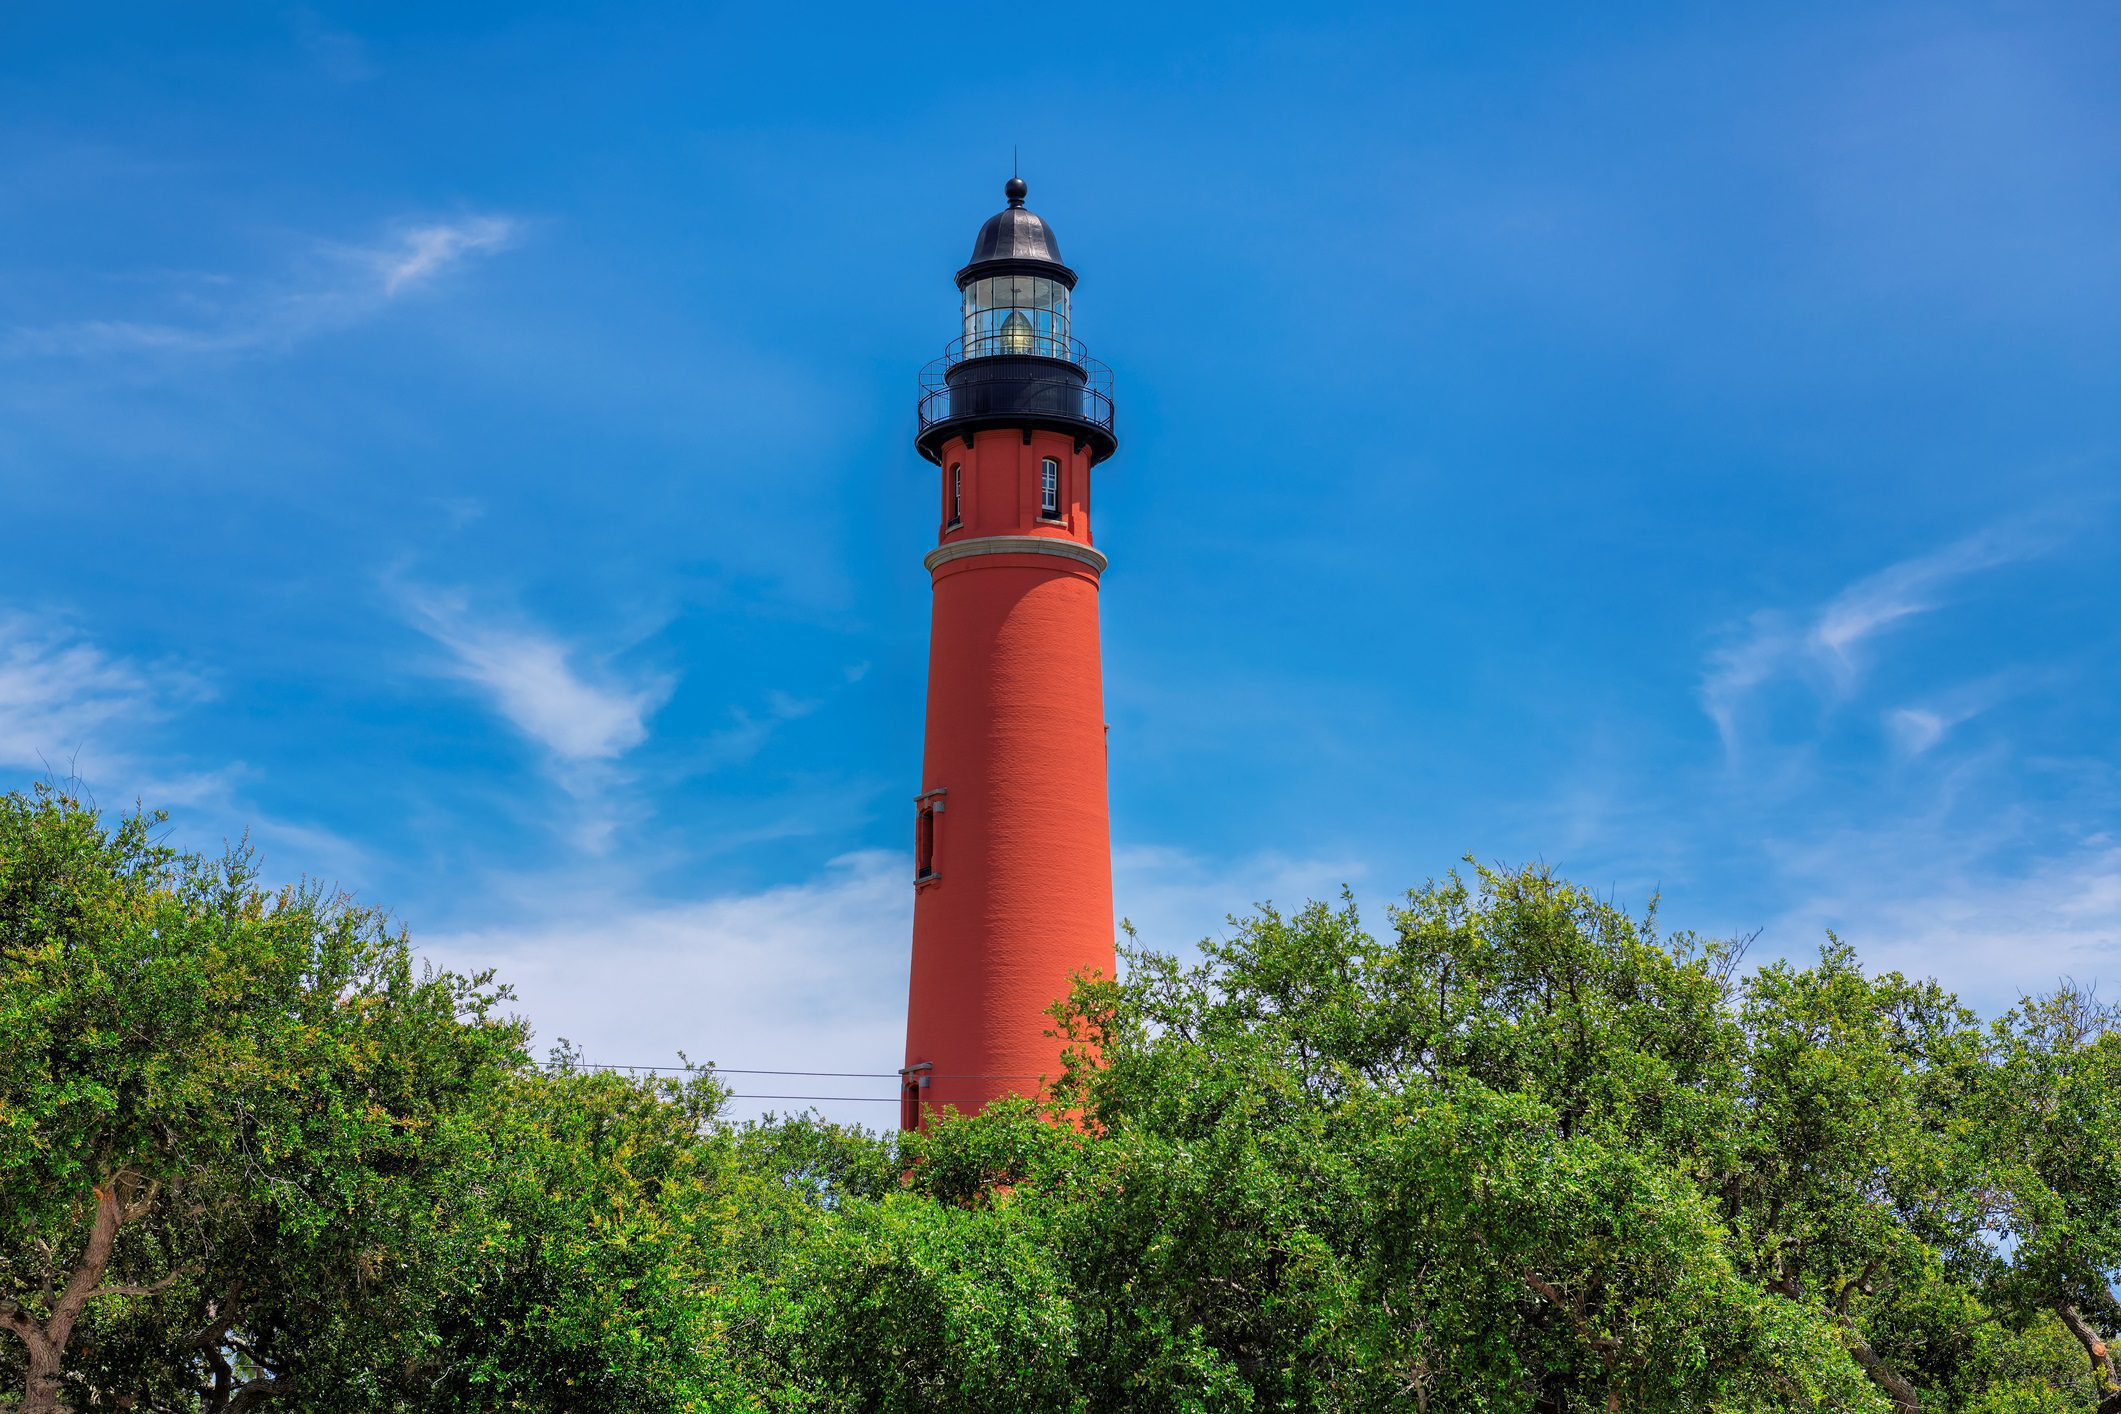 Ponce Inlet Kighthouse, State Park, Florida Coastline, Historical Landmark